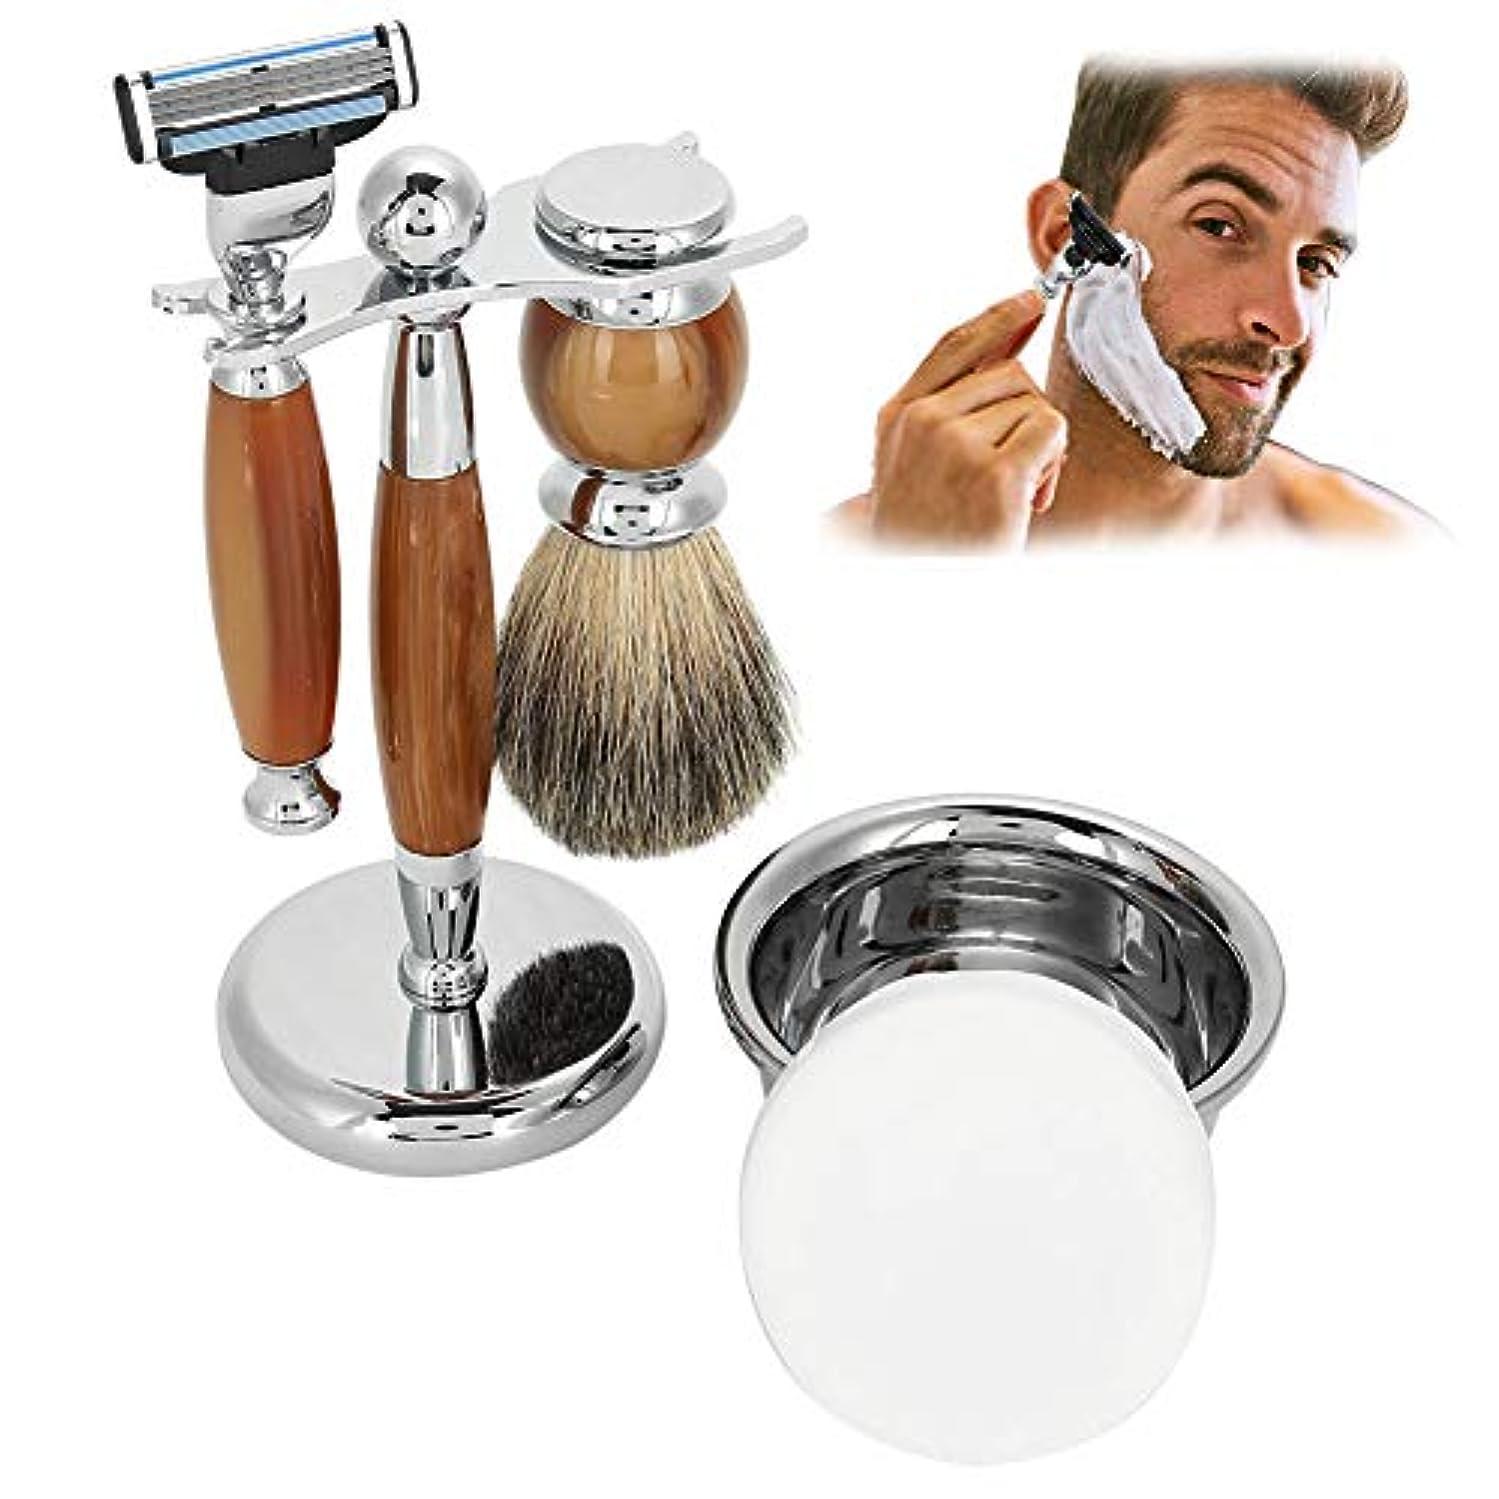 Semme 5 in 1シェービングセットメンズ耐久性のある剃毛ツール高級木製ハンドル手動シェーバーブラシスタンドステンレス鋼シェービングボウルと石鹸(#2(模造瑪瑙箱))